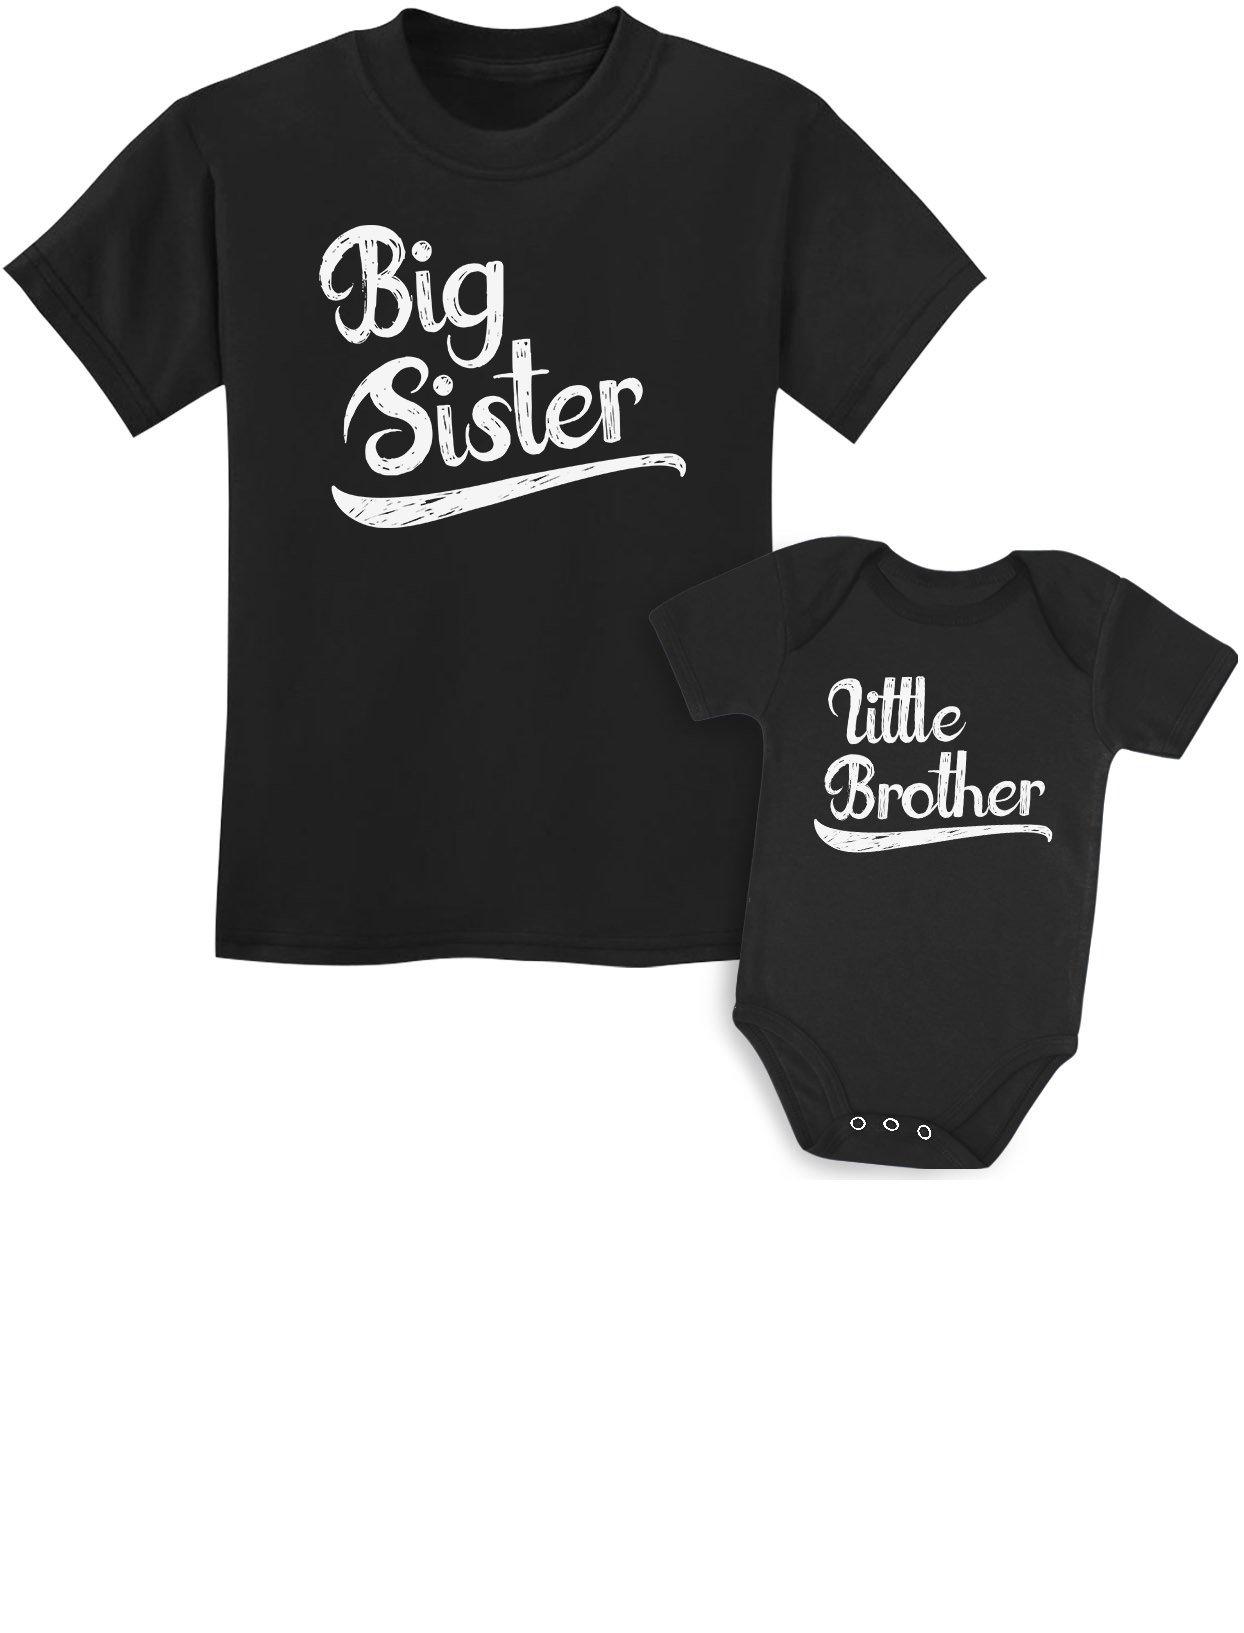 Sibling Shirts Set for Sisters and Brothers Girls & Boys Gift Set Girls Shirt Black/Baby Black Kids Shirt 4T / Baby 6M